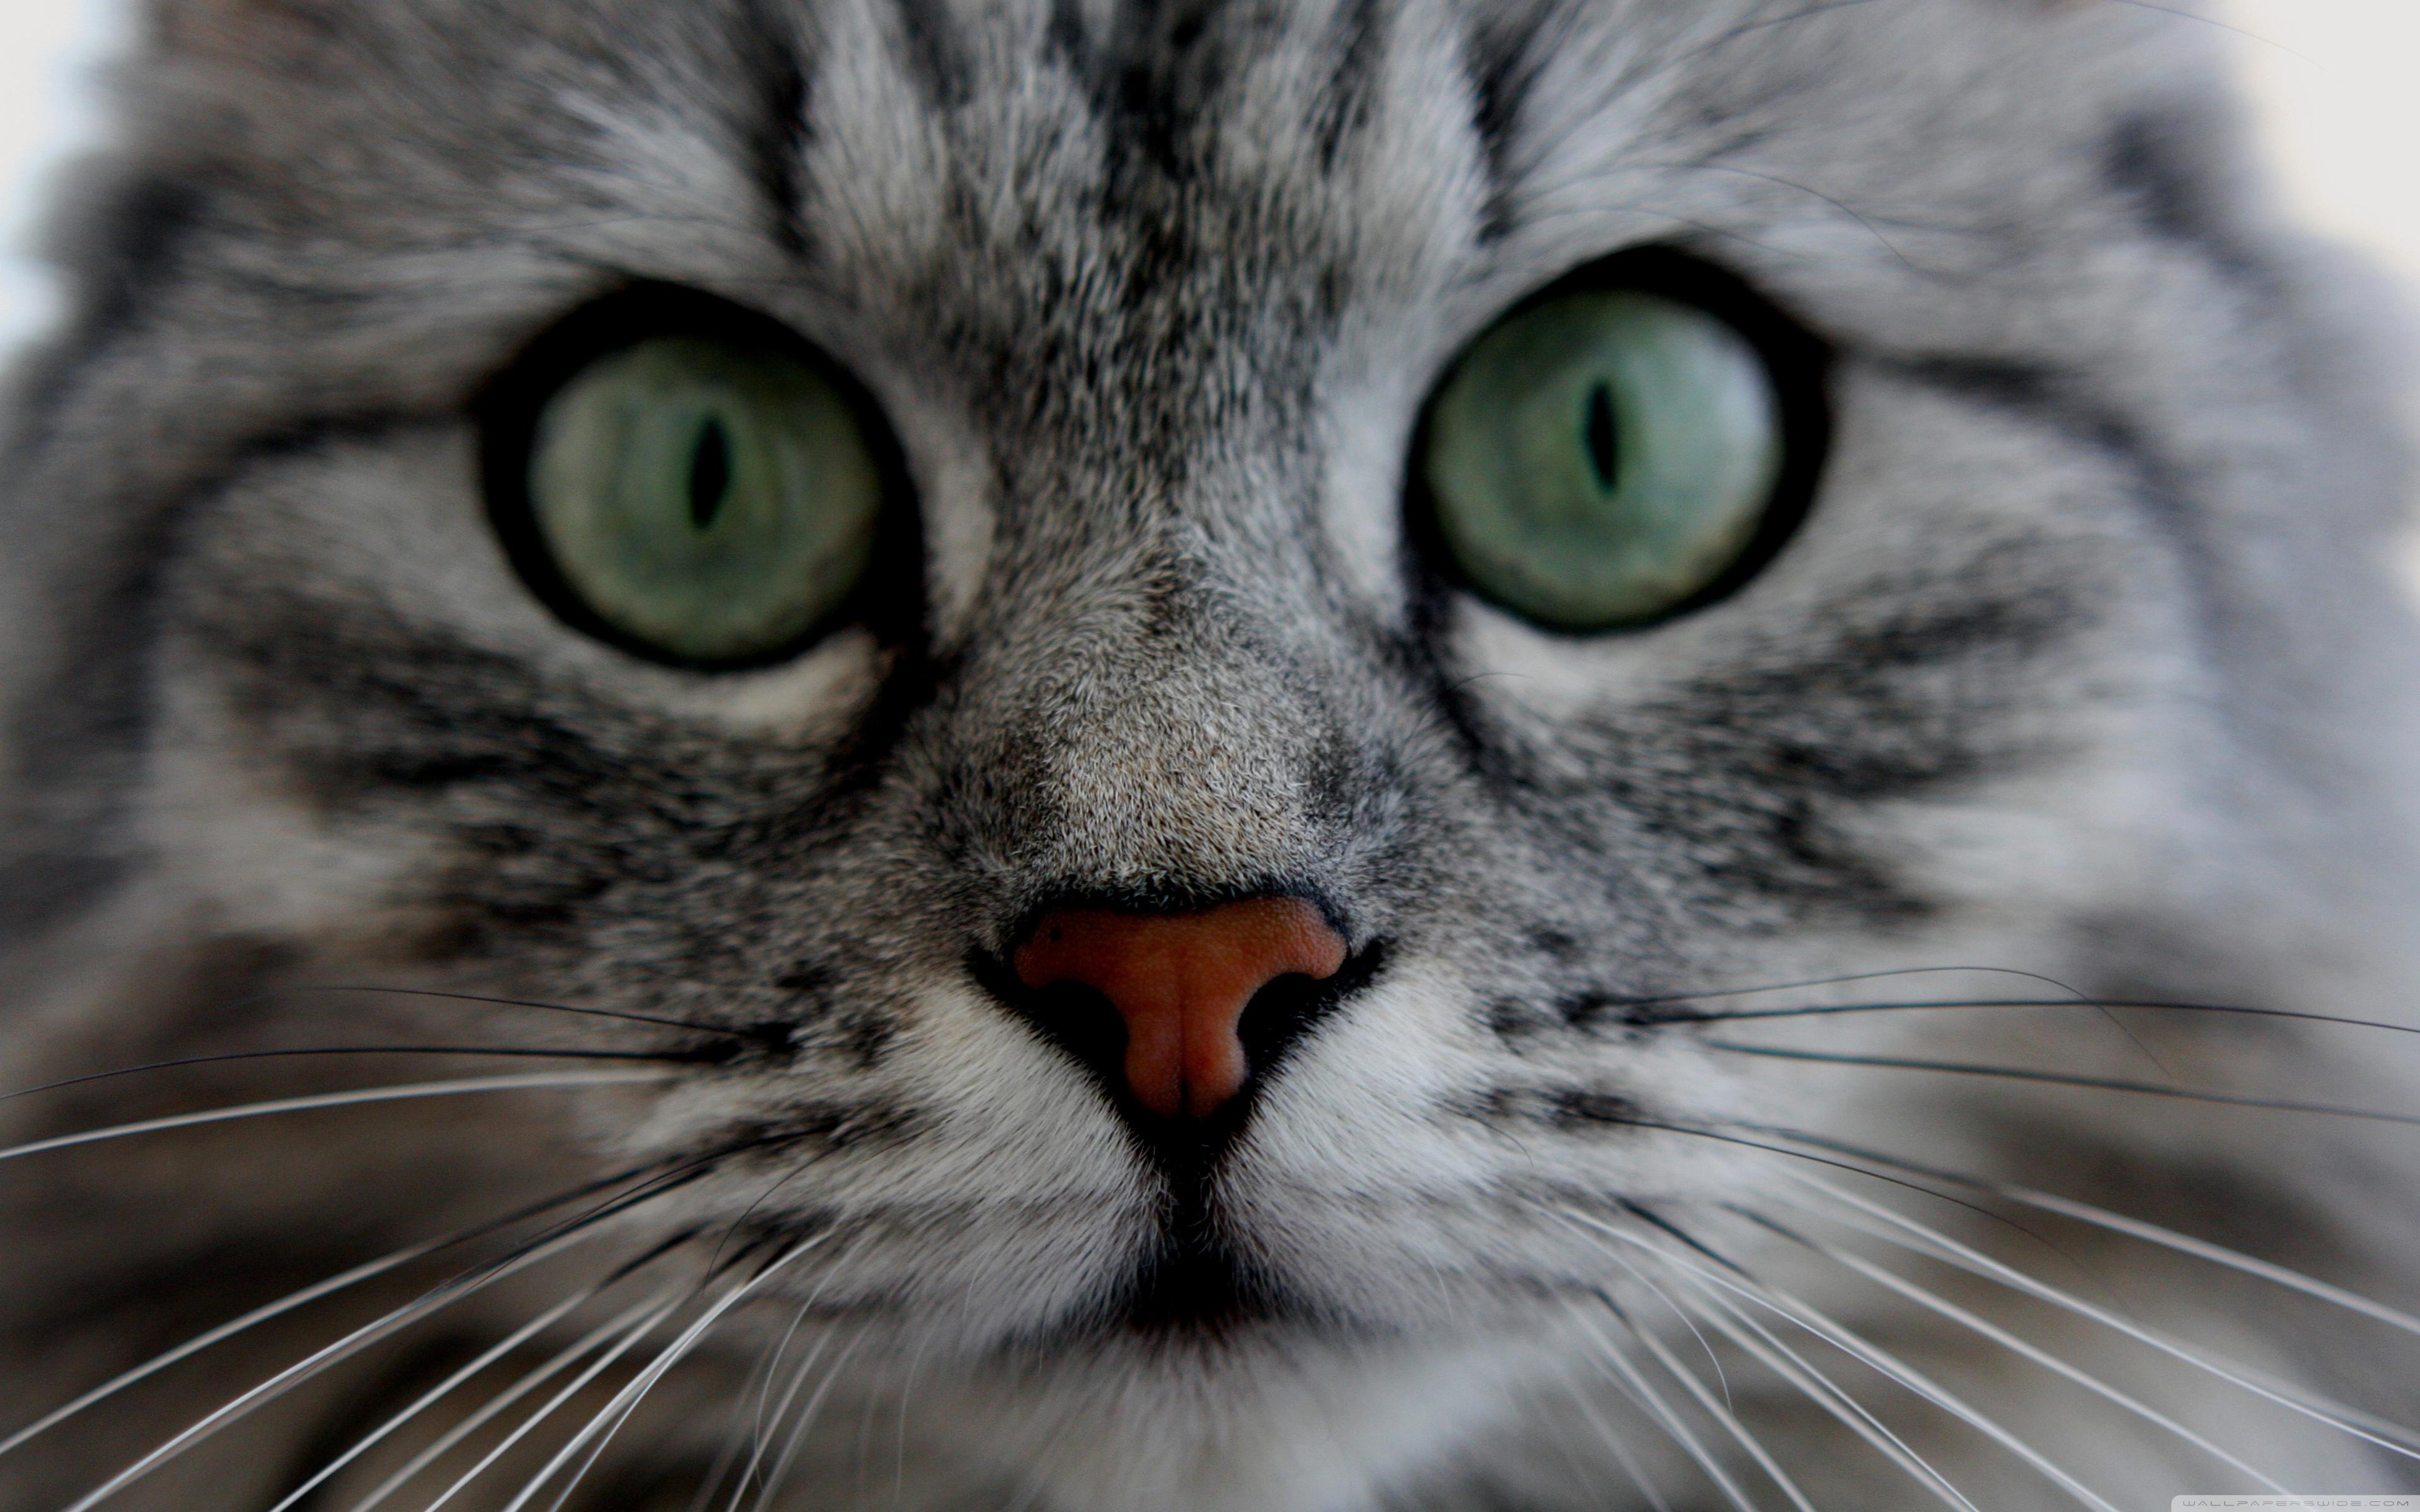 Cat Close up ❤ 4K HD Desktop Wallpaper for 4K Ultra HD TV • Tablet ...